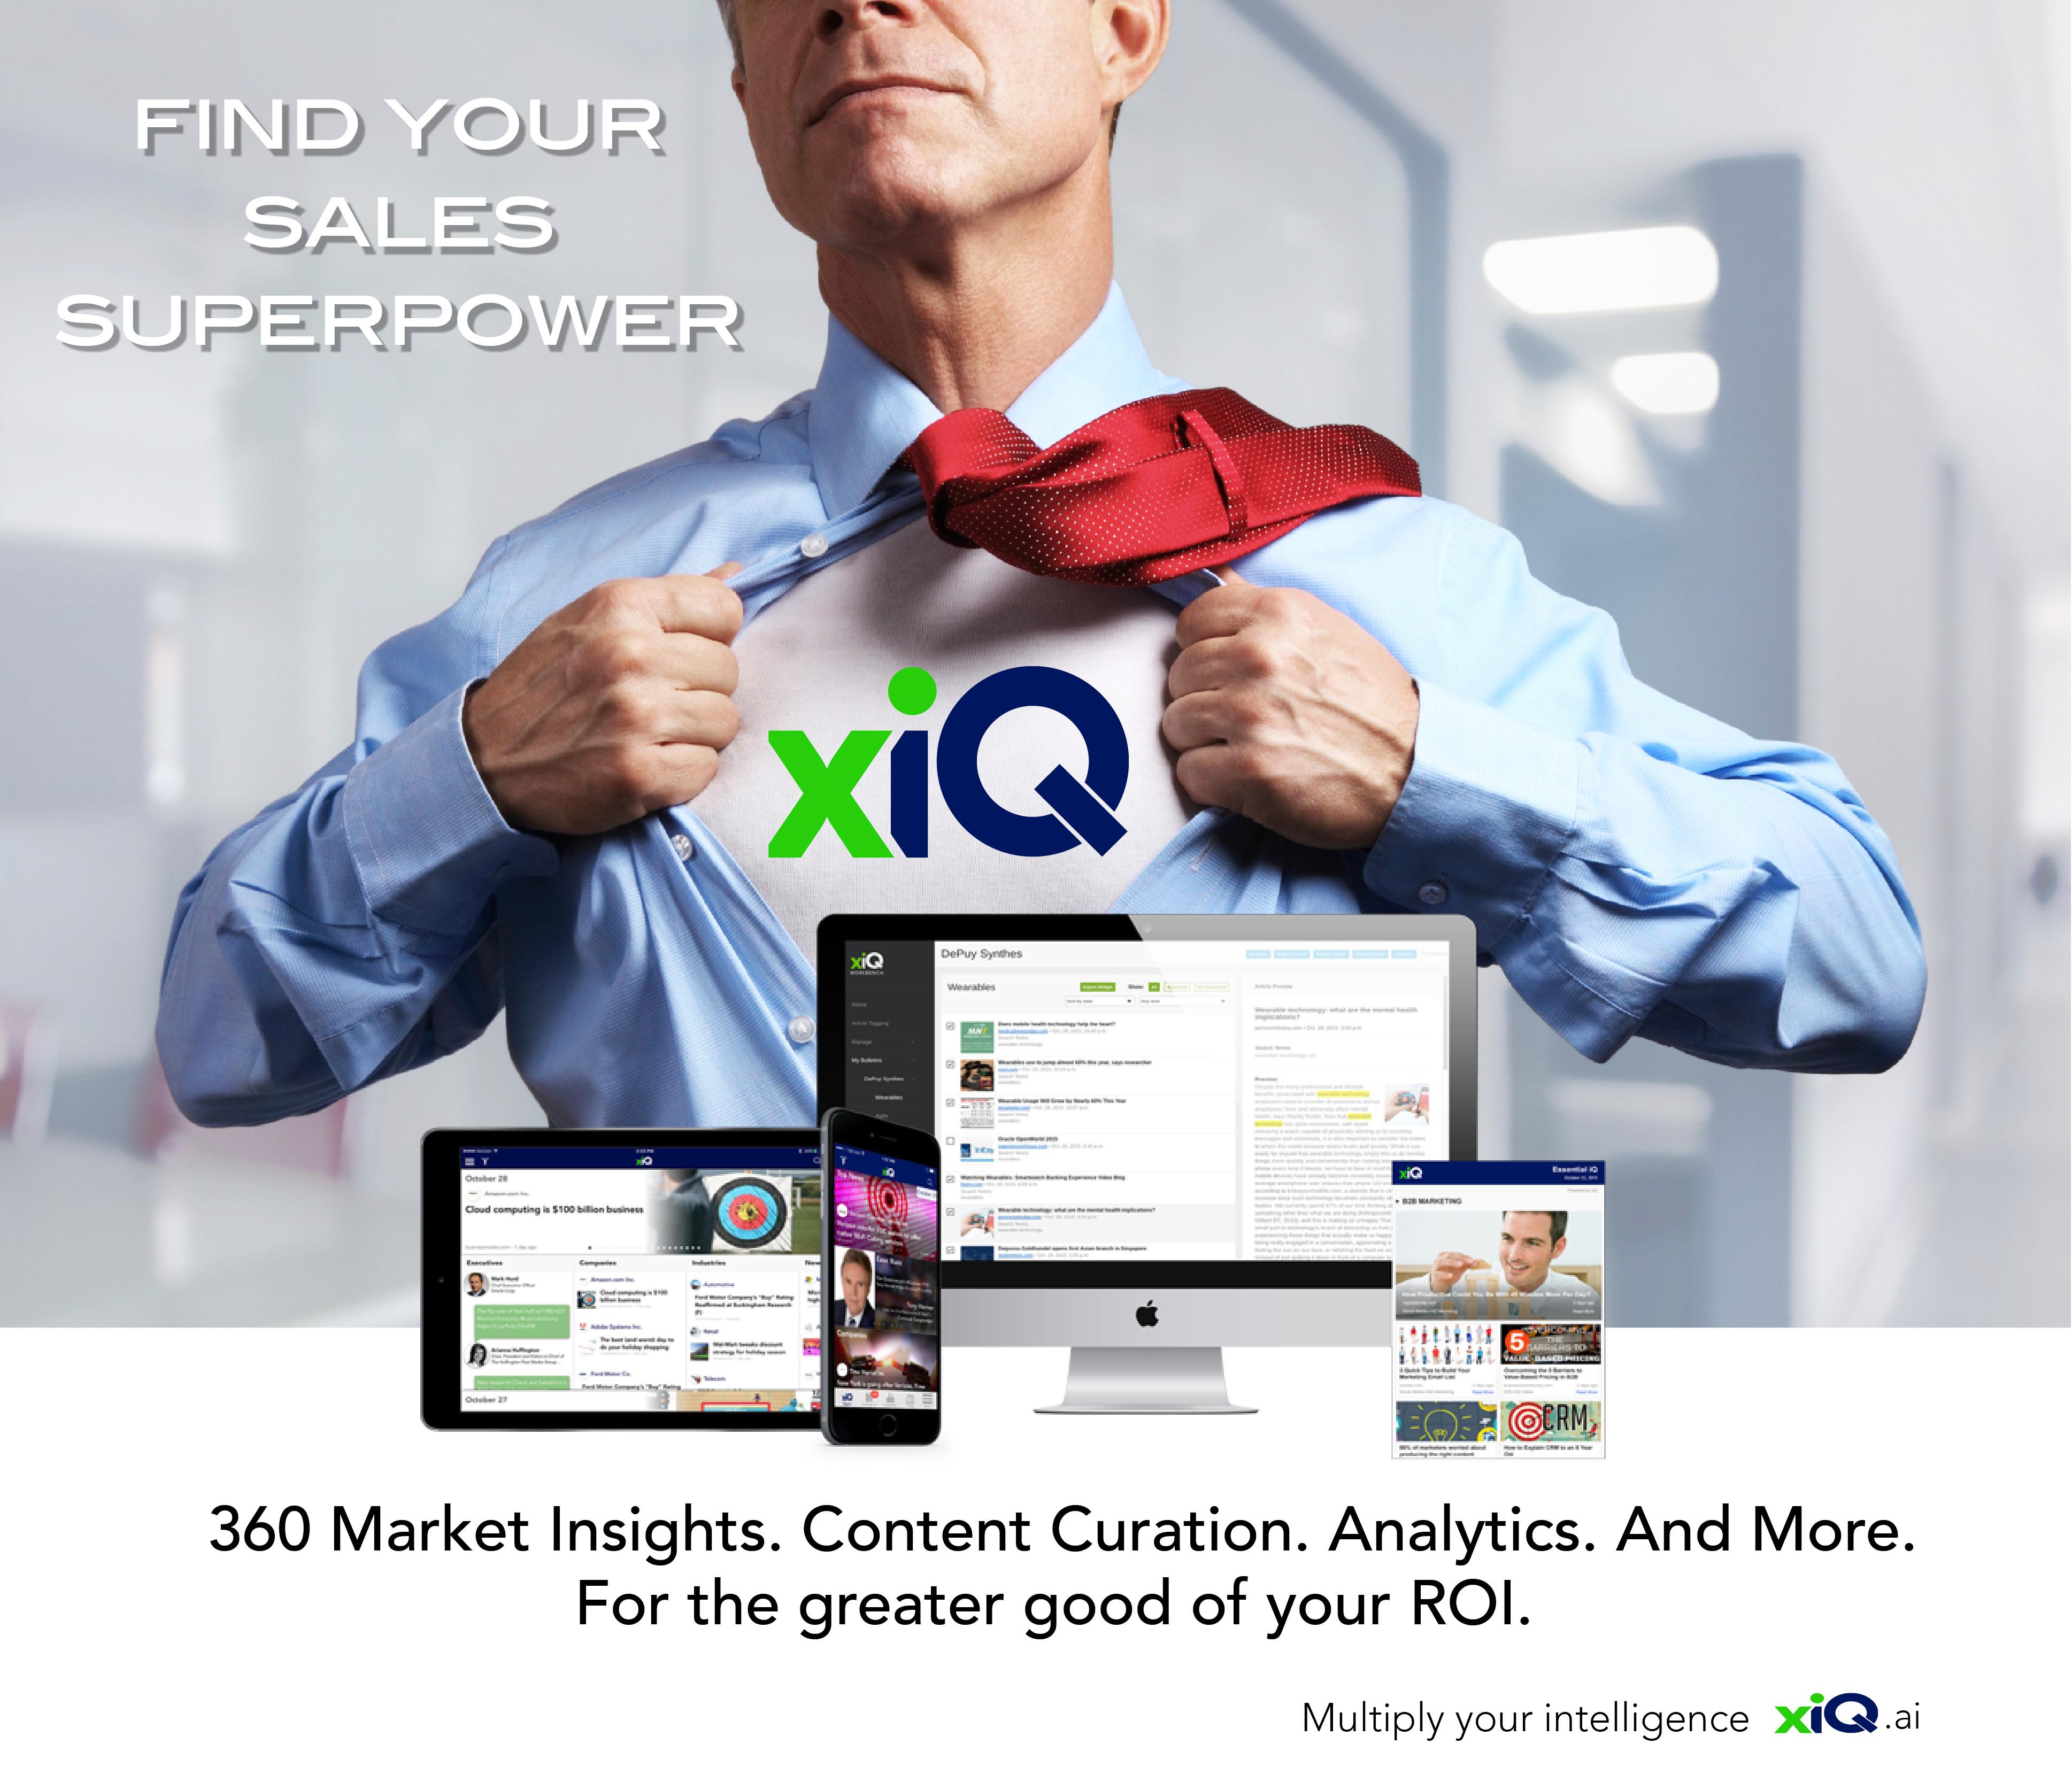 xiQ Business Intelligence